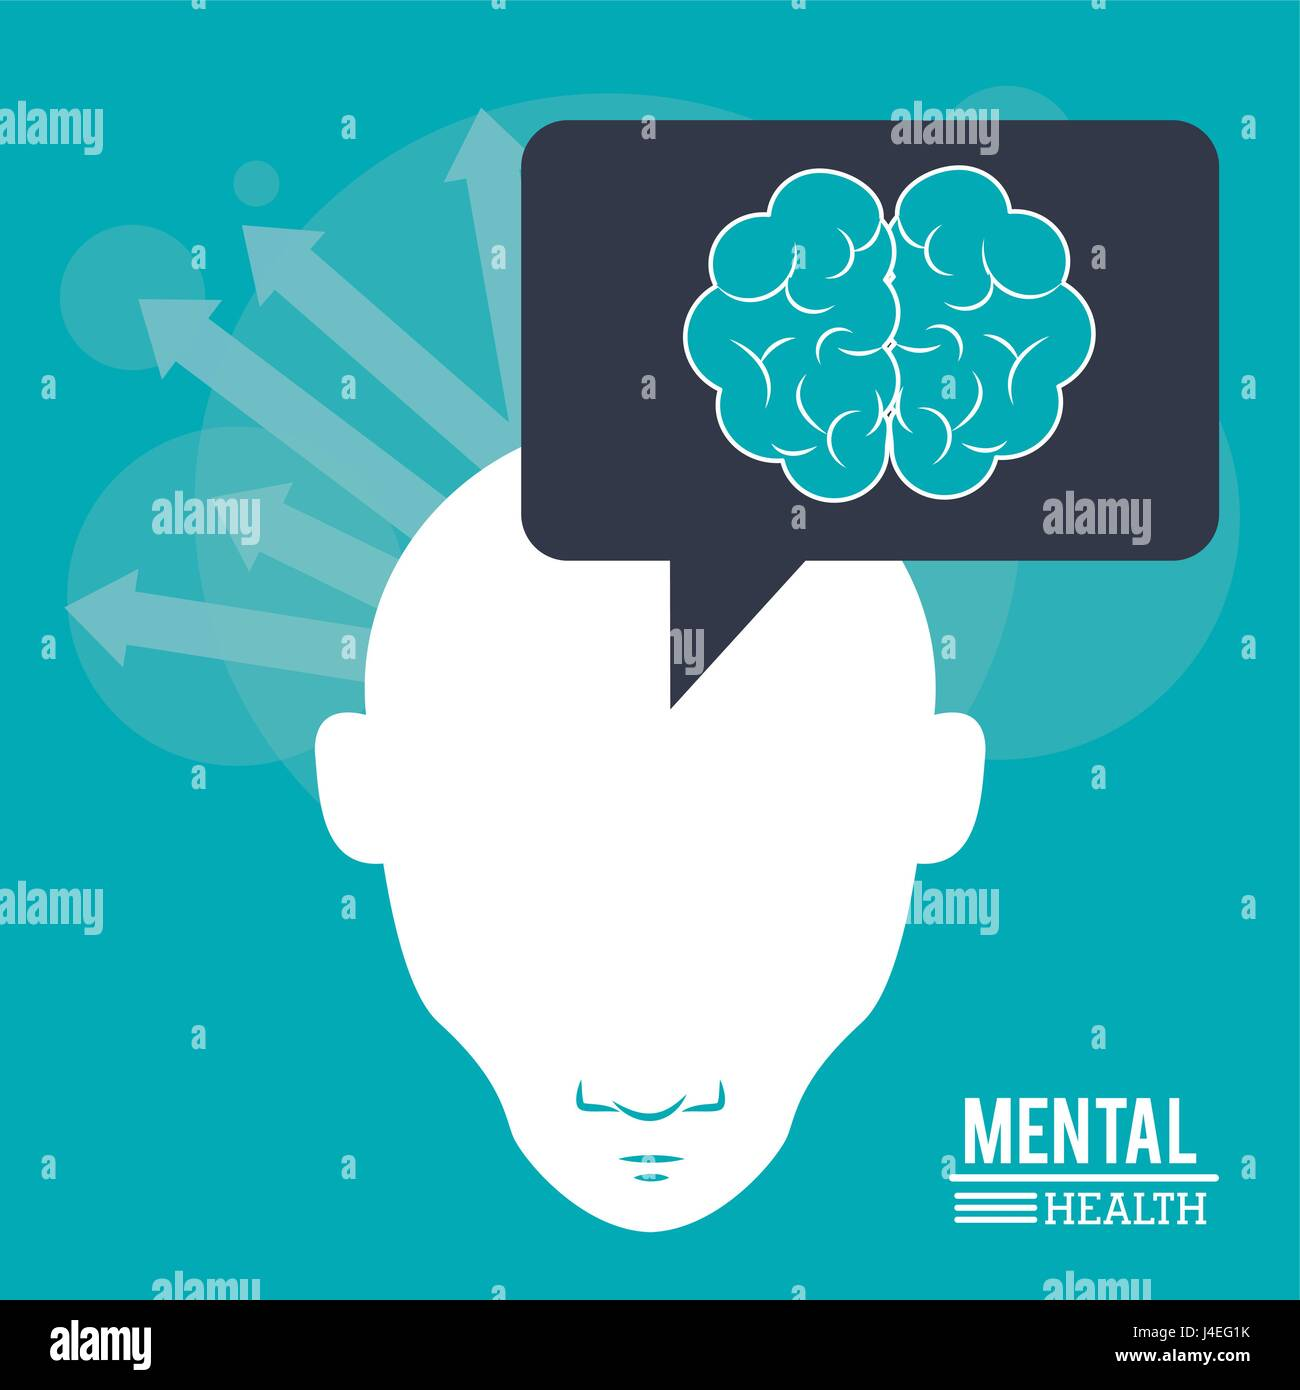 mental health, human head with brain arrows thinking image - Stock Vector